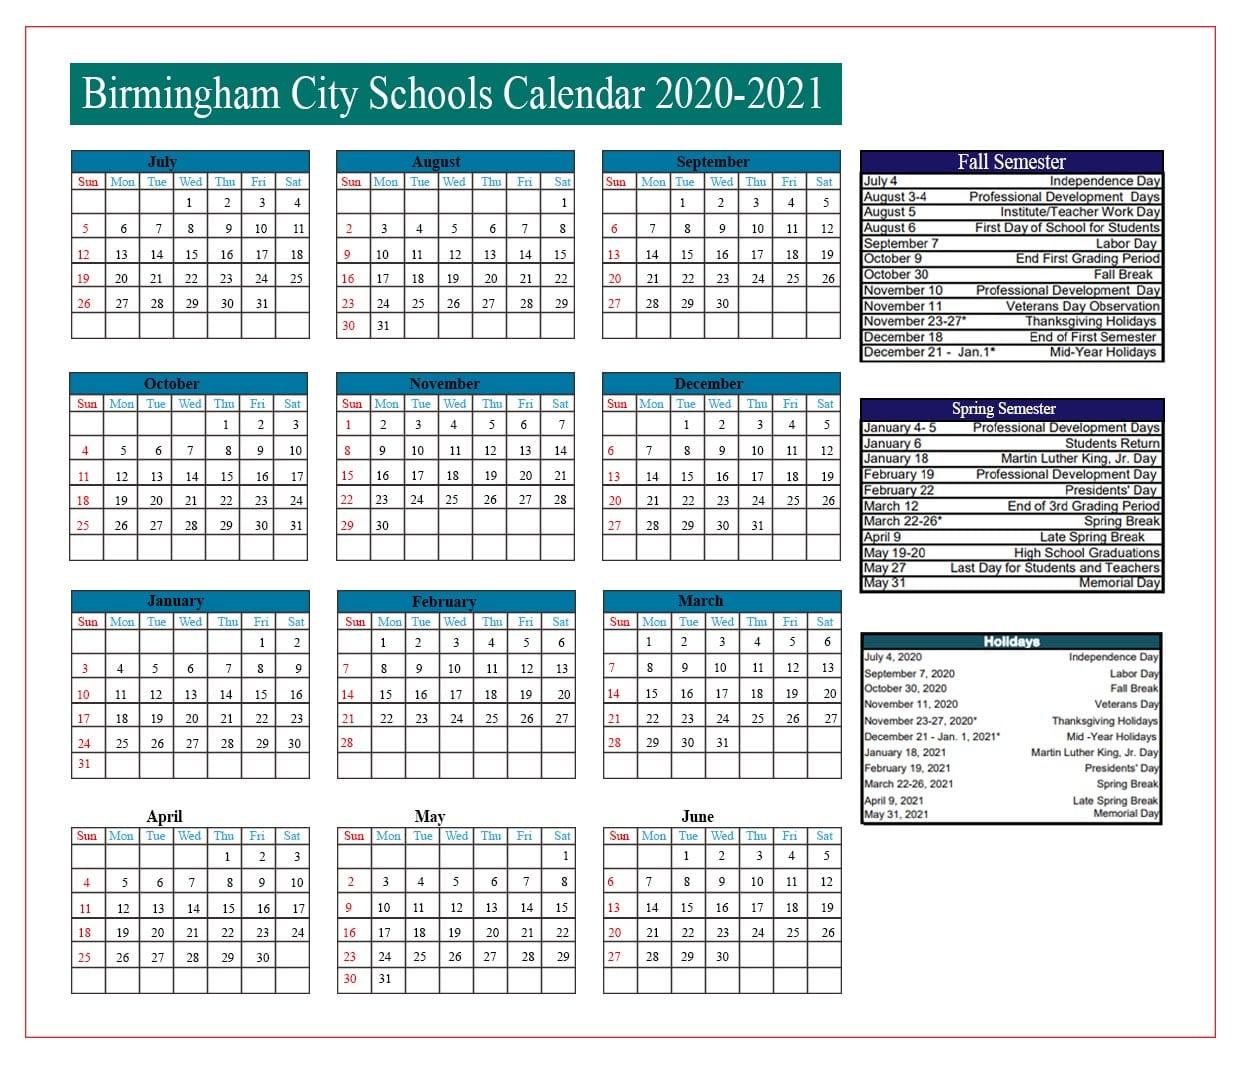 University Of Michigan Academic Calendar 2020 2021 With Gsu Academic Calendar 2021